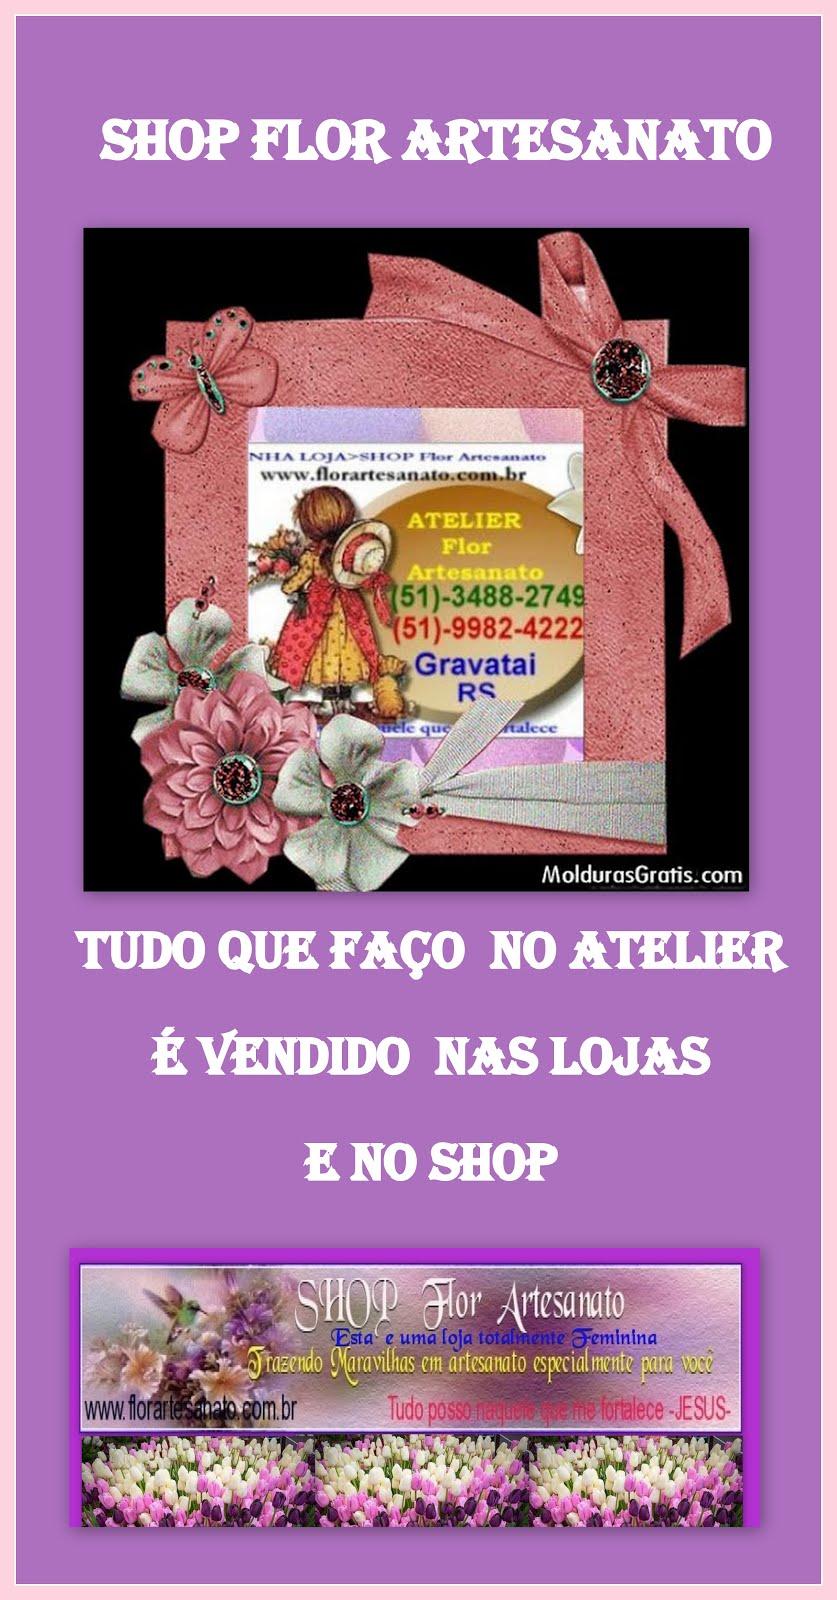 SHOP FLOR ARTESANATO